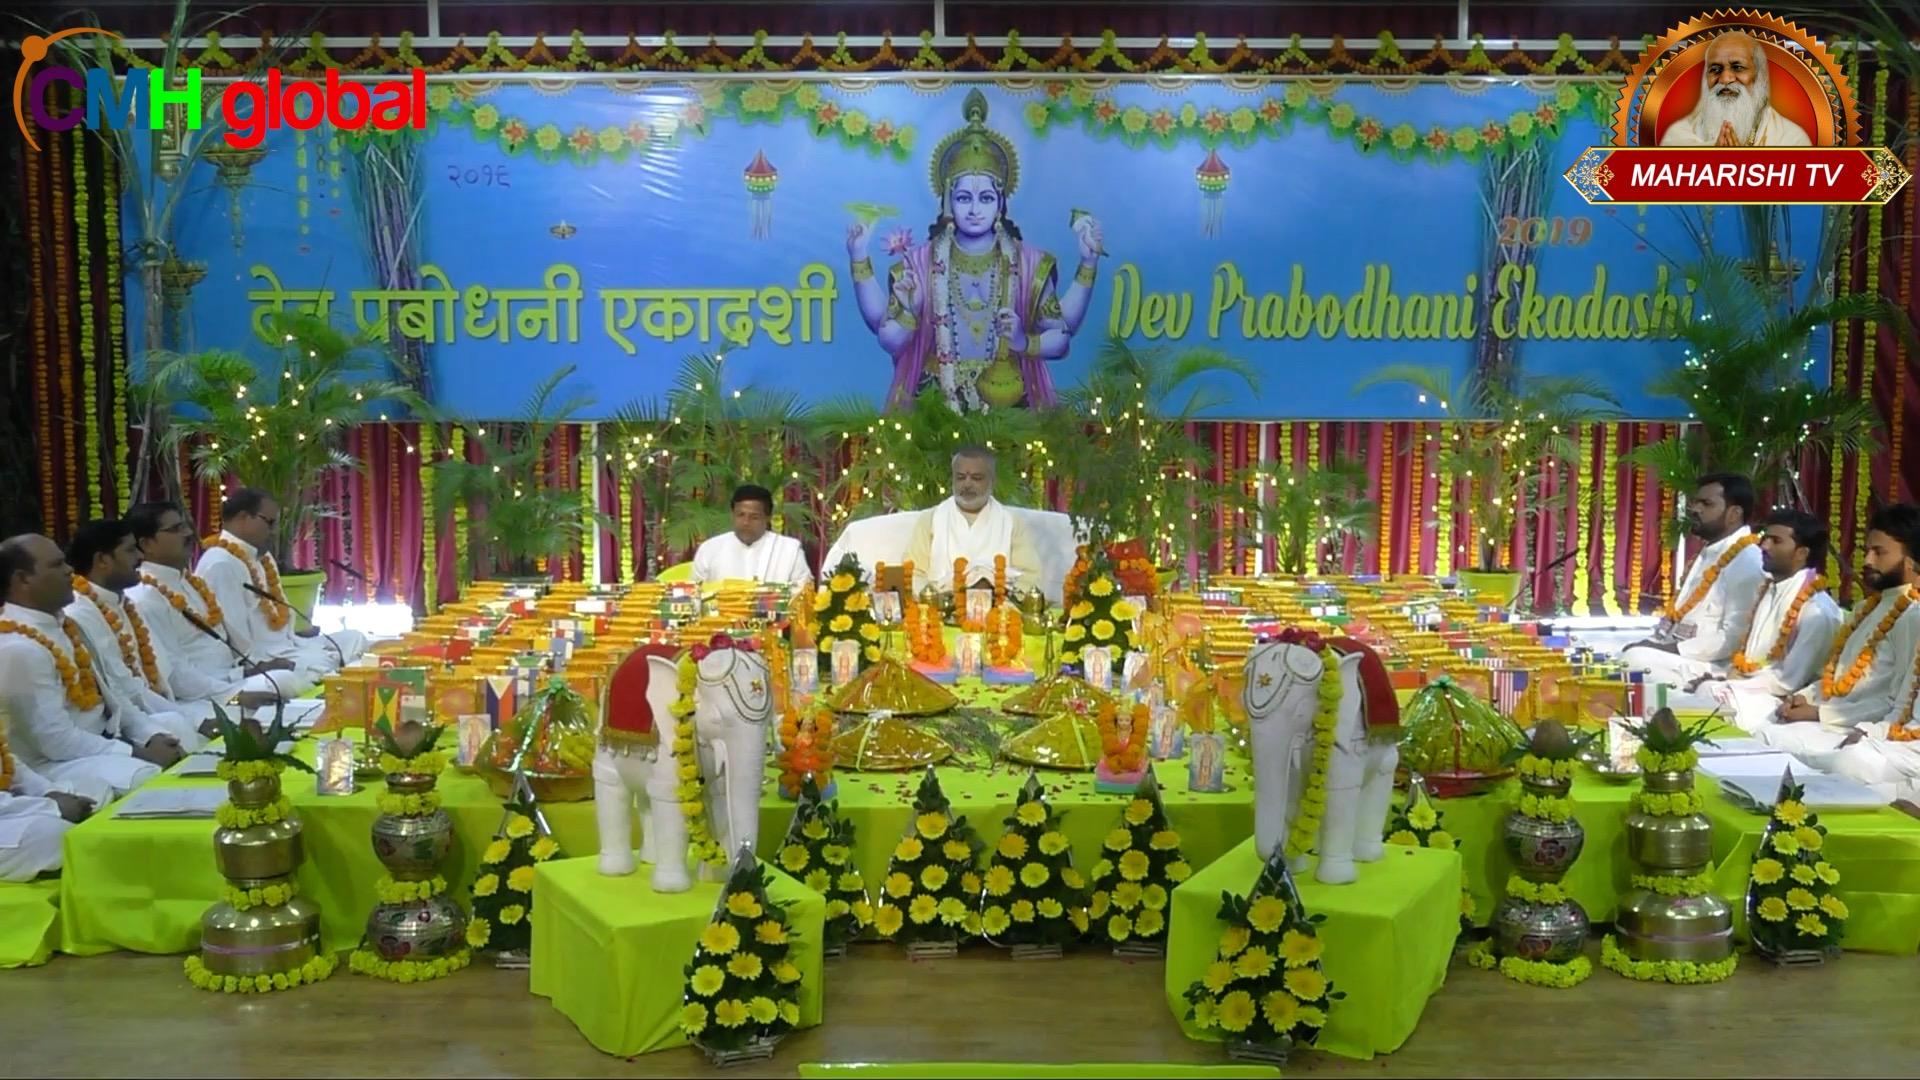 Dev Prabodhani Ekadashi Pujan Ep-05, 2019